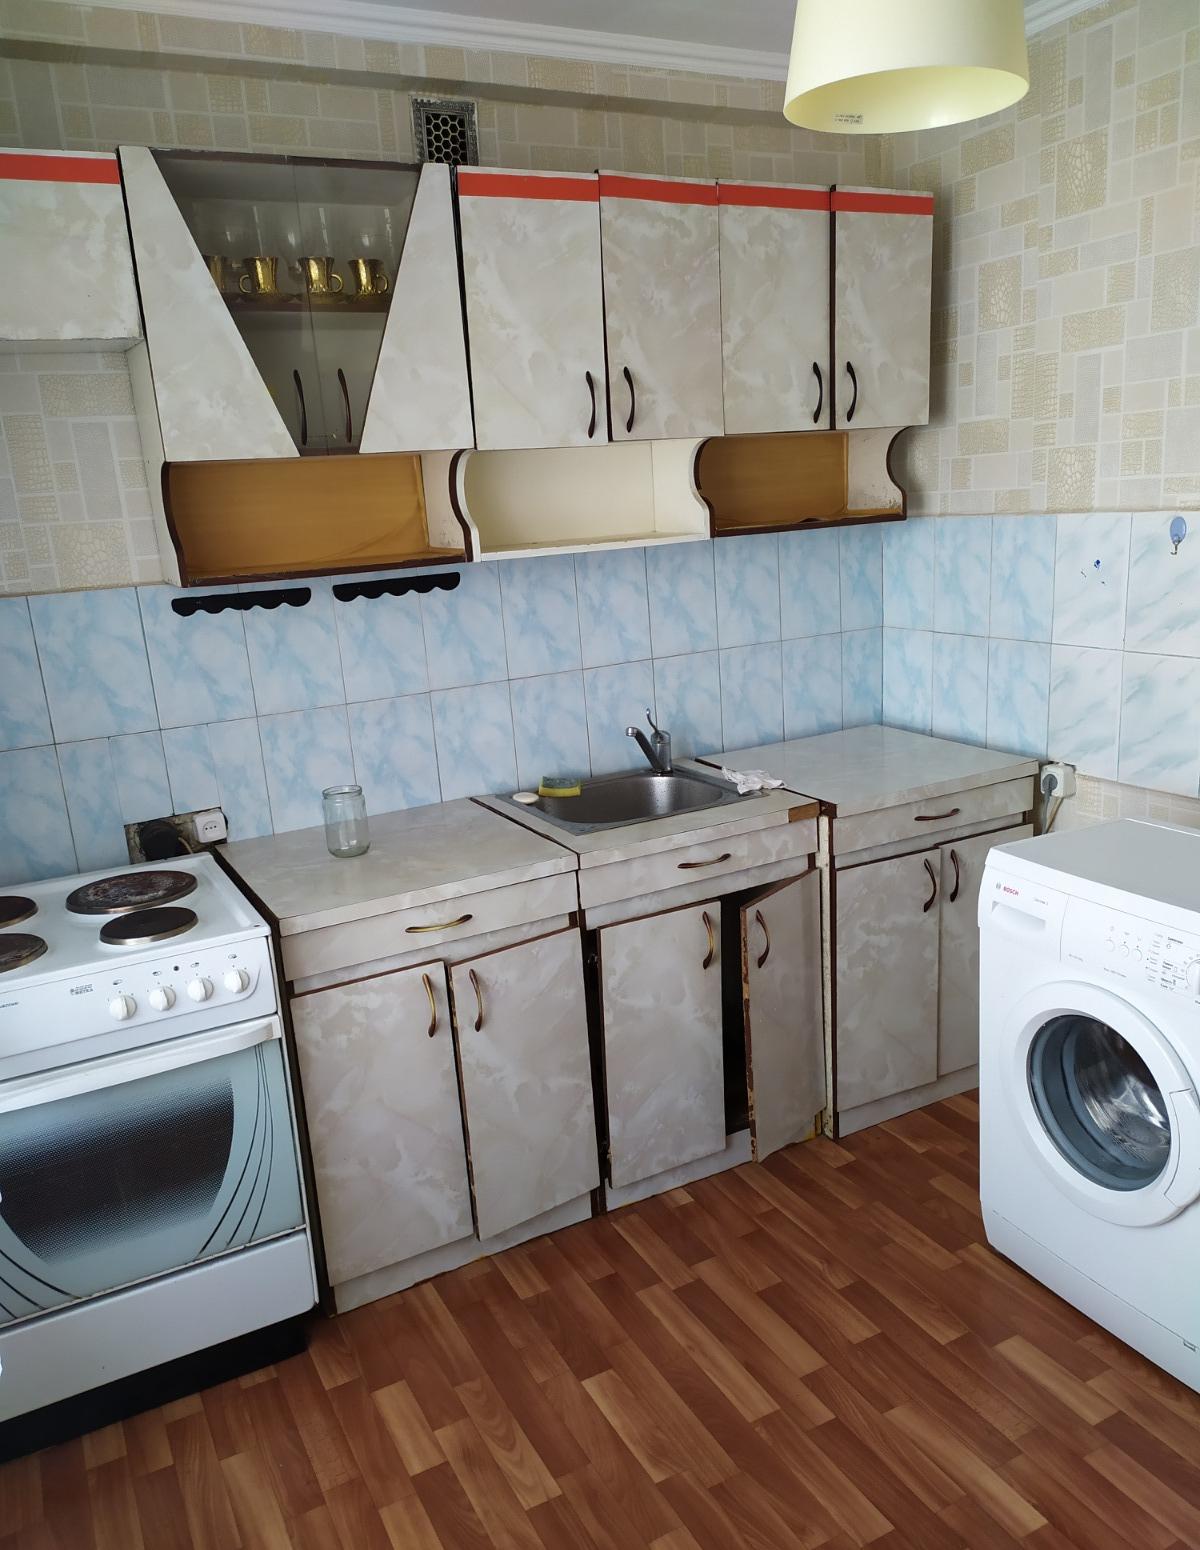 2к квартира ул Сады, д 4 | 15500 | аренда в Красноярске фото 1